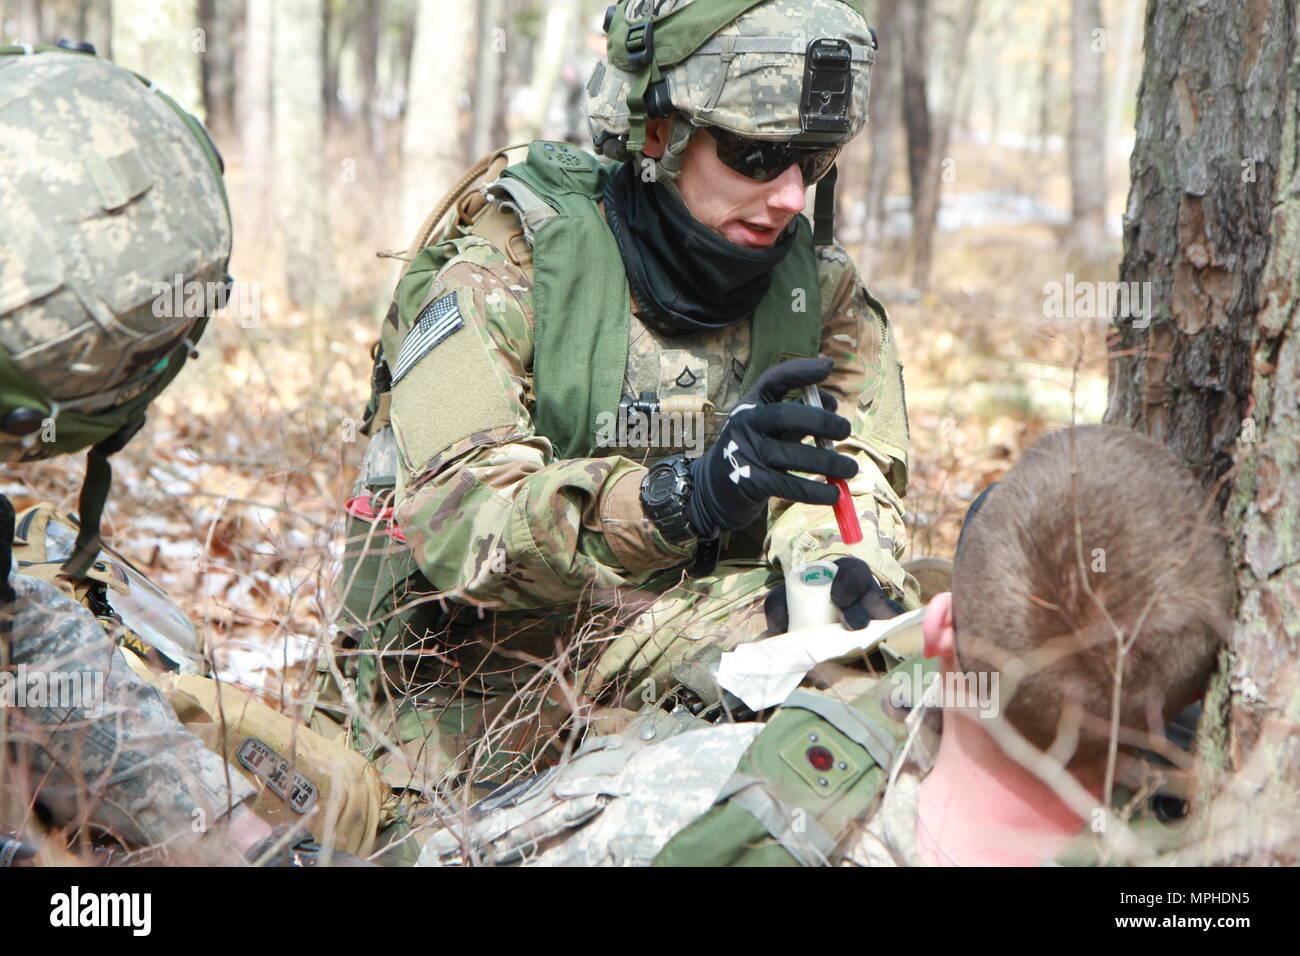 U S  Army Medic Private First Class Luke Albro treats Specialist